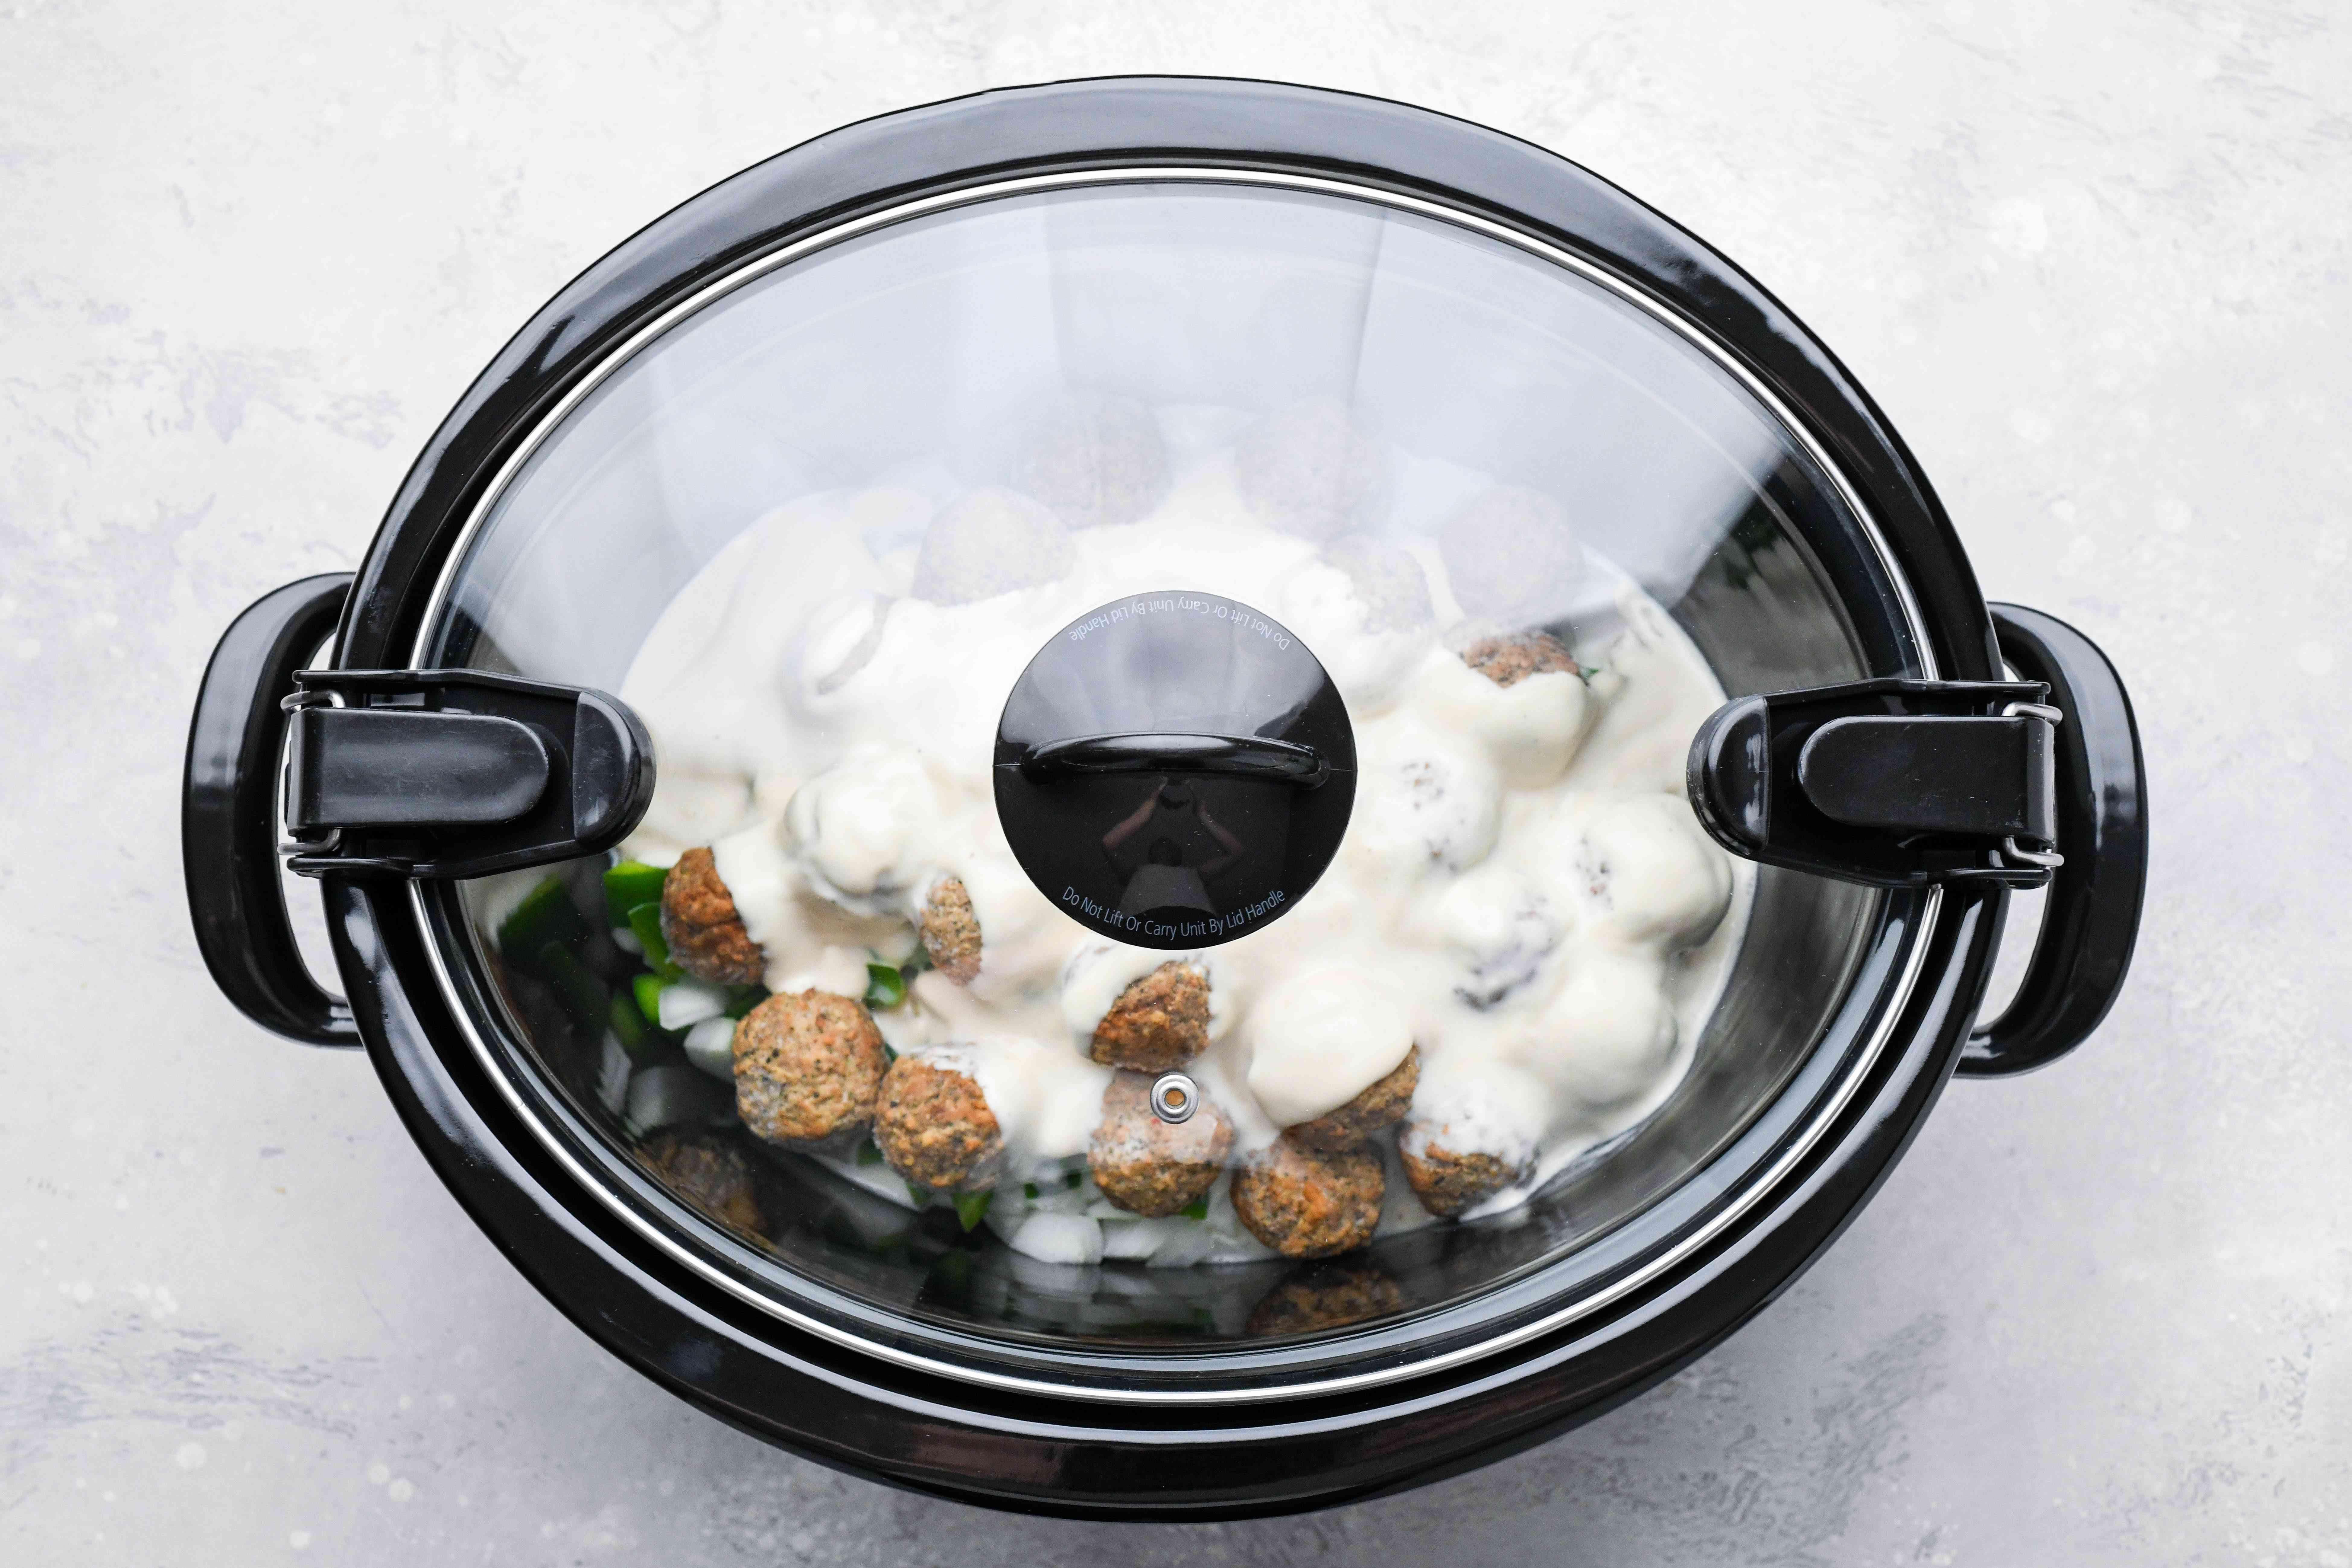 Creamy Pesto Meatballs in a slow cooker